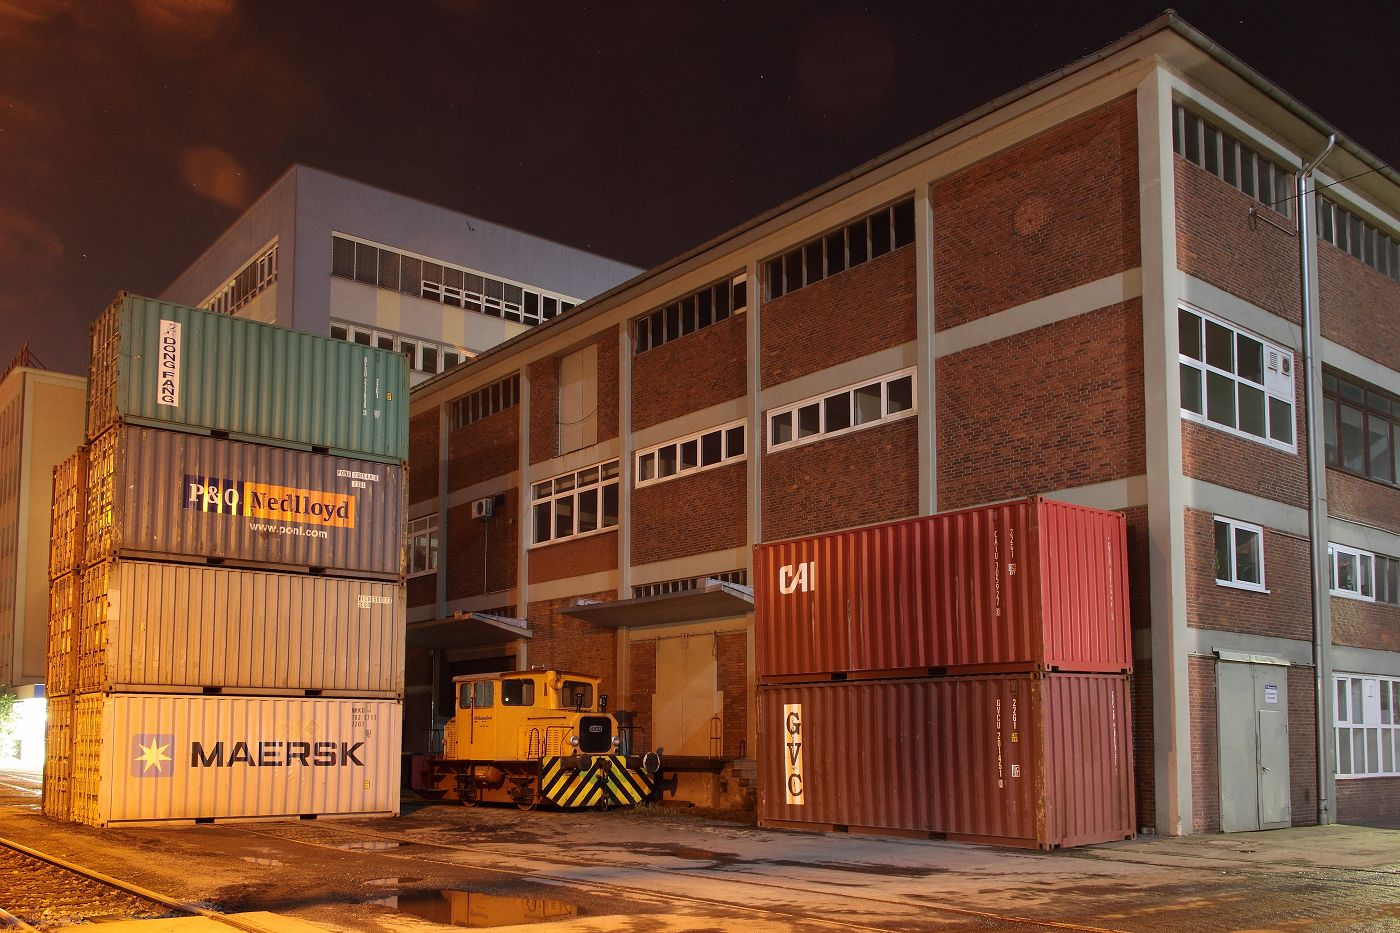 http://www.nachtbahner.de/Fotos/2014-01-10%20Industrieh%C3%A4fen/k-IMG_0569_Industrieh%C3%A4fen%2010.01.14%20%281%29.JPG